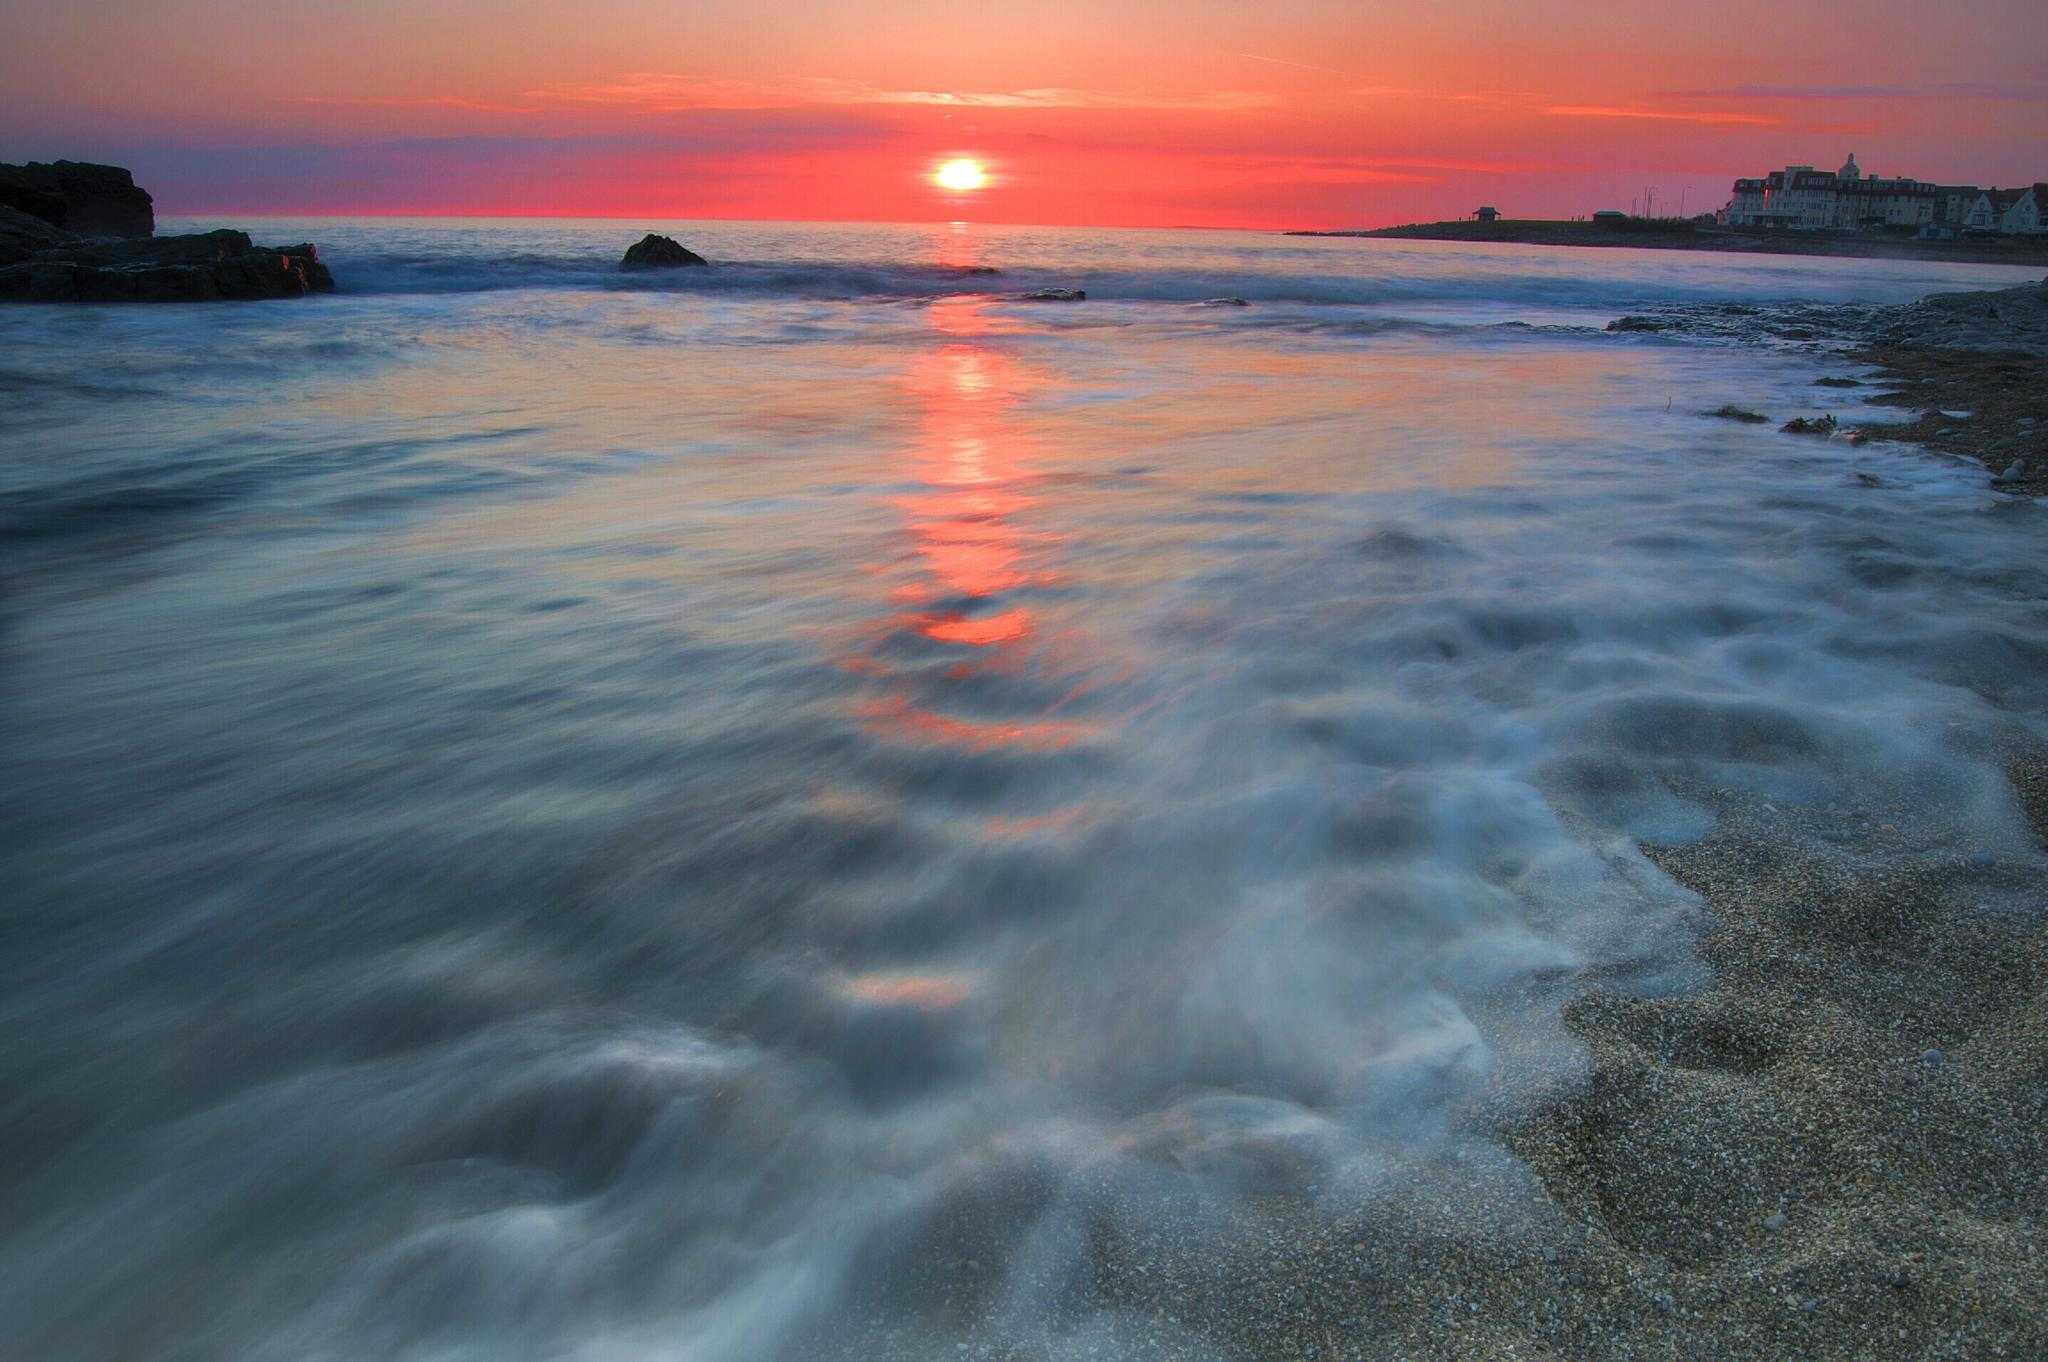 sunset by bryan.ashford 52